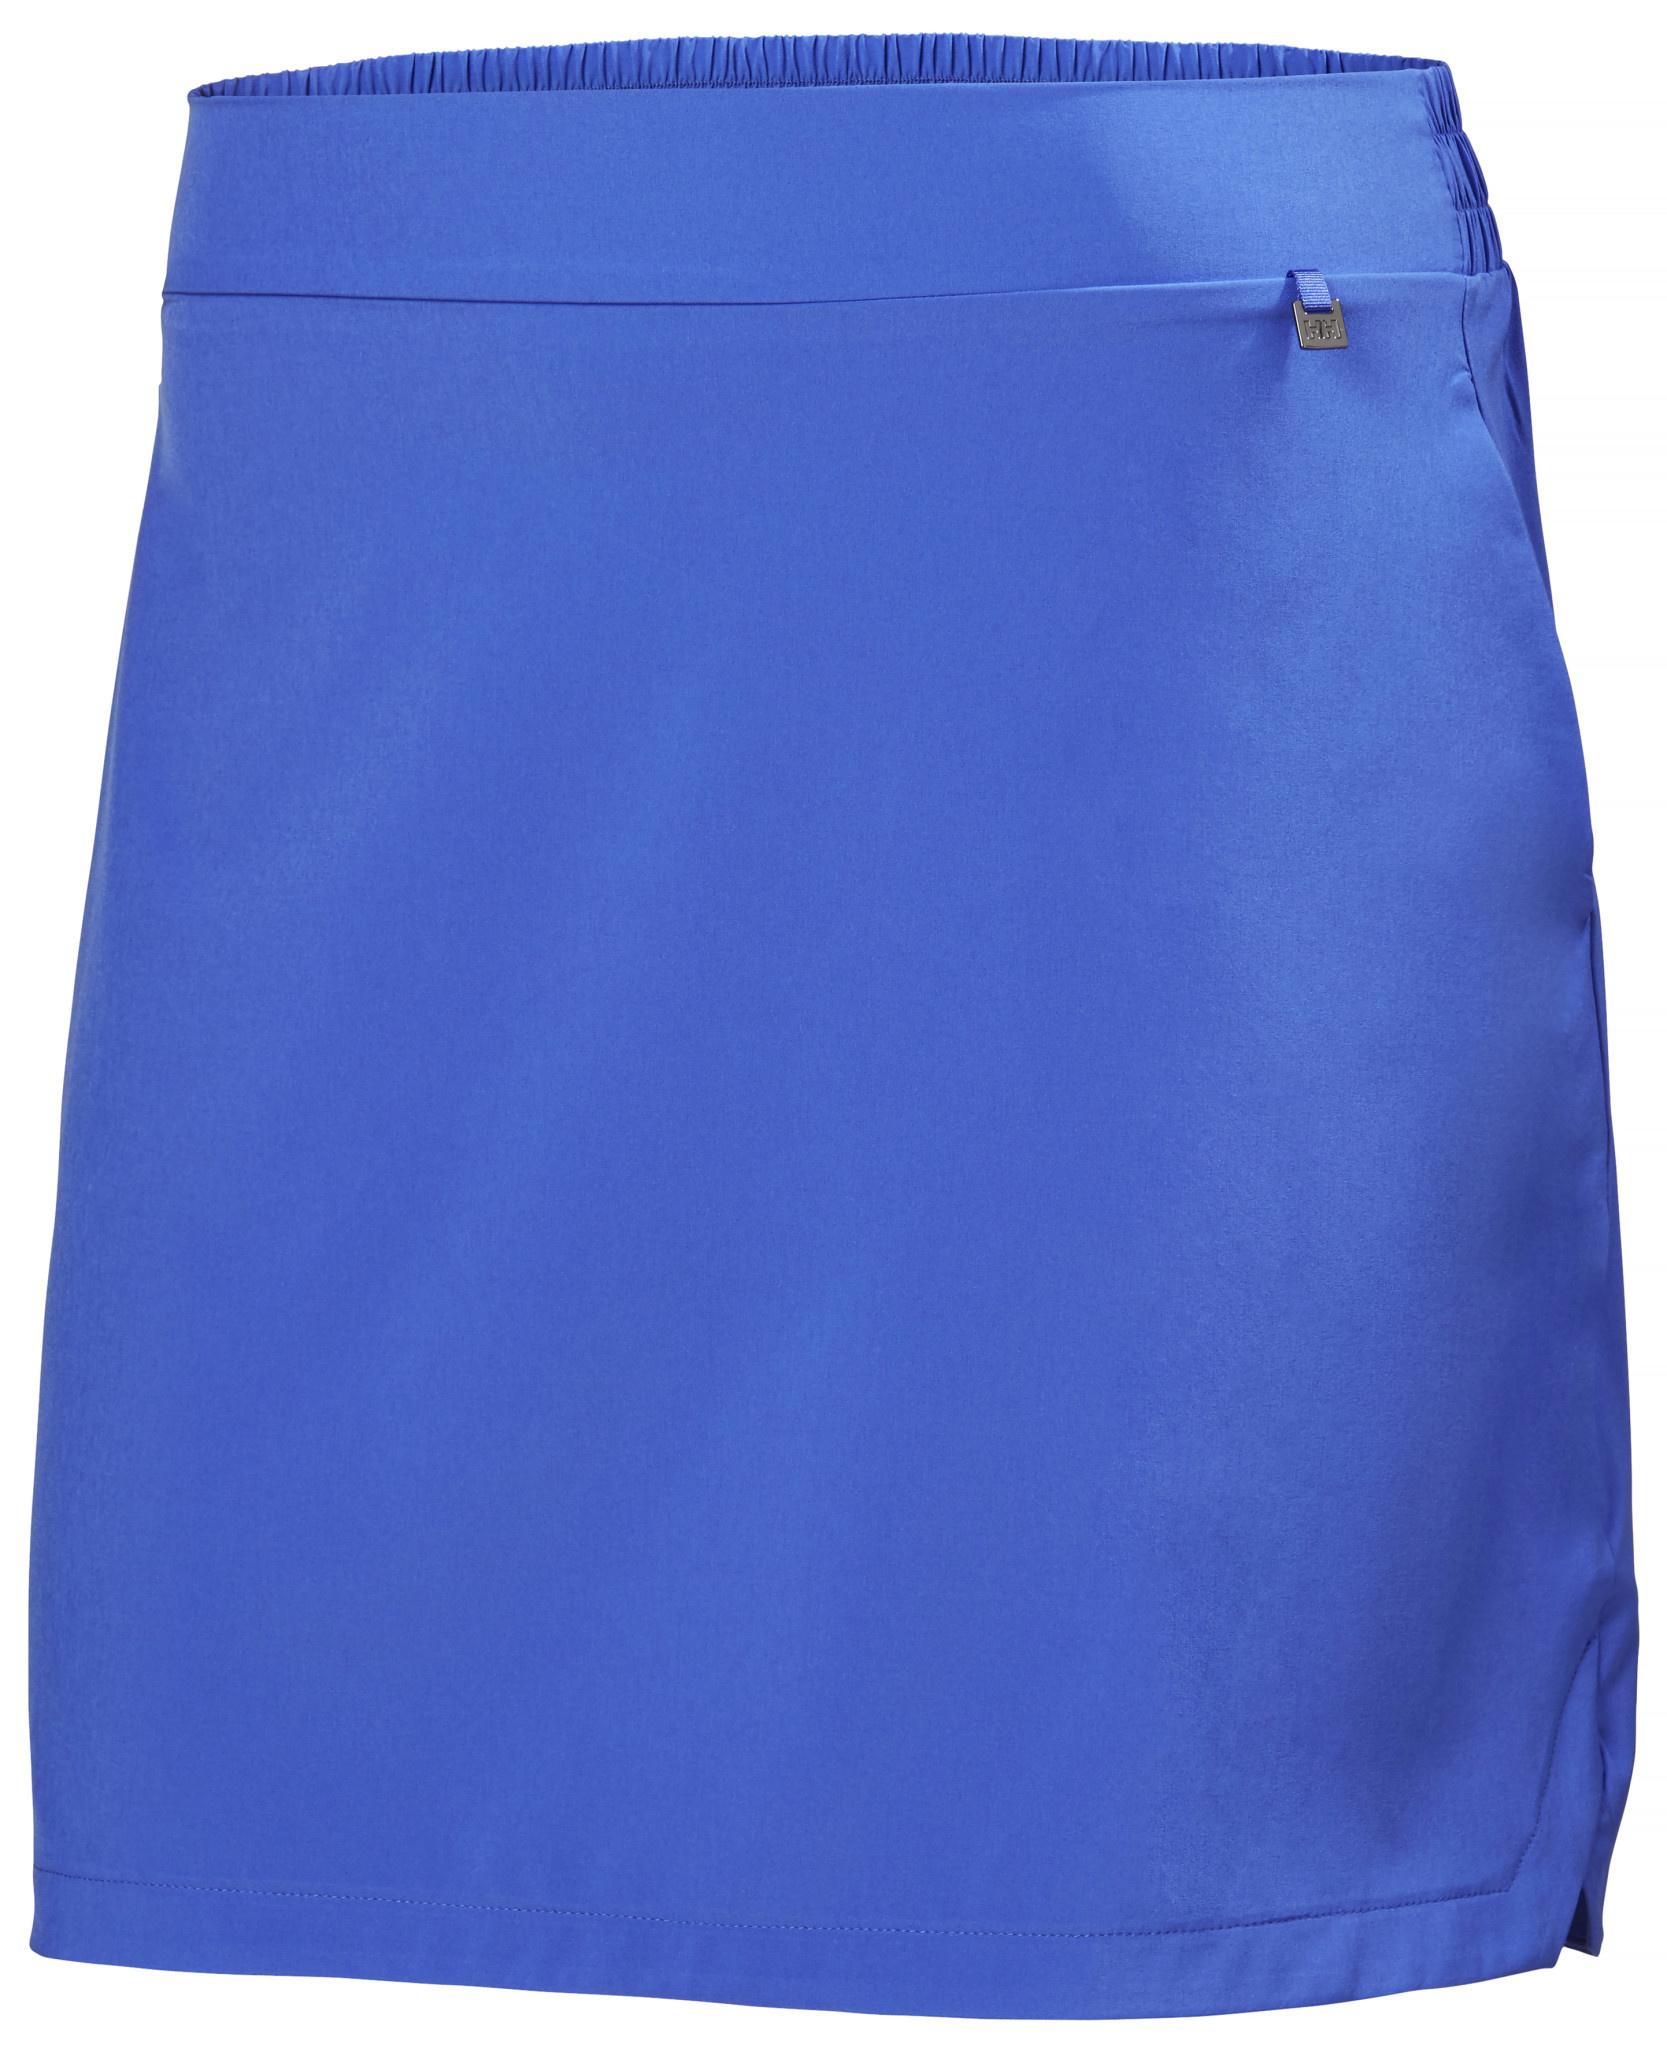 Helly Hansen Thalia Skirt - Royal Blue